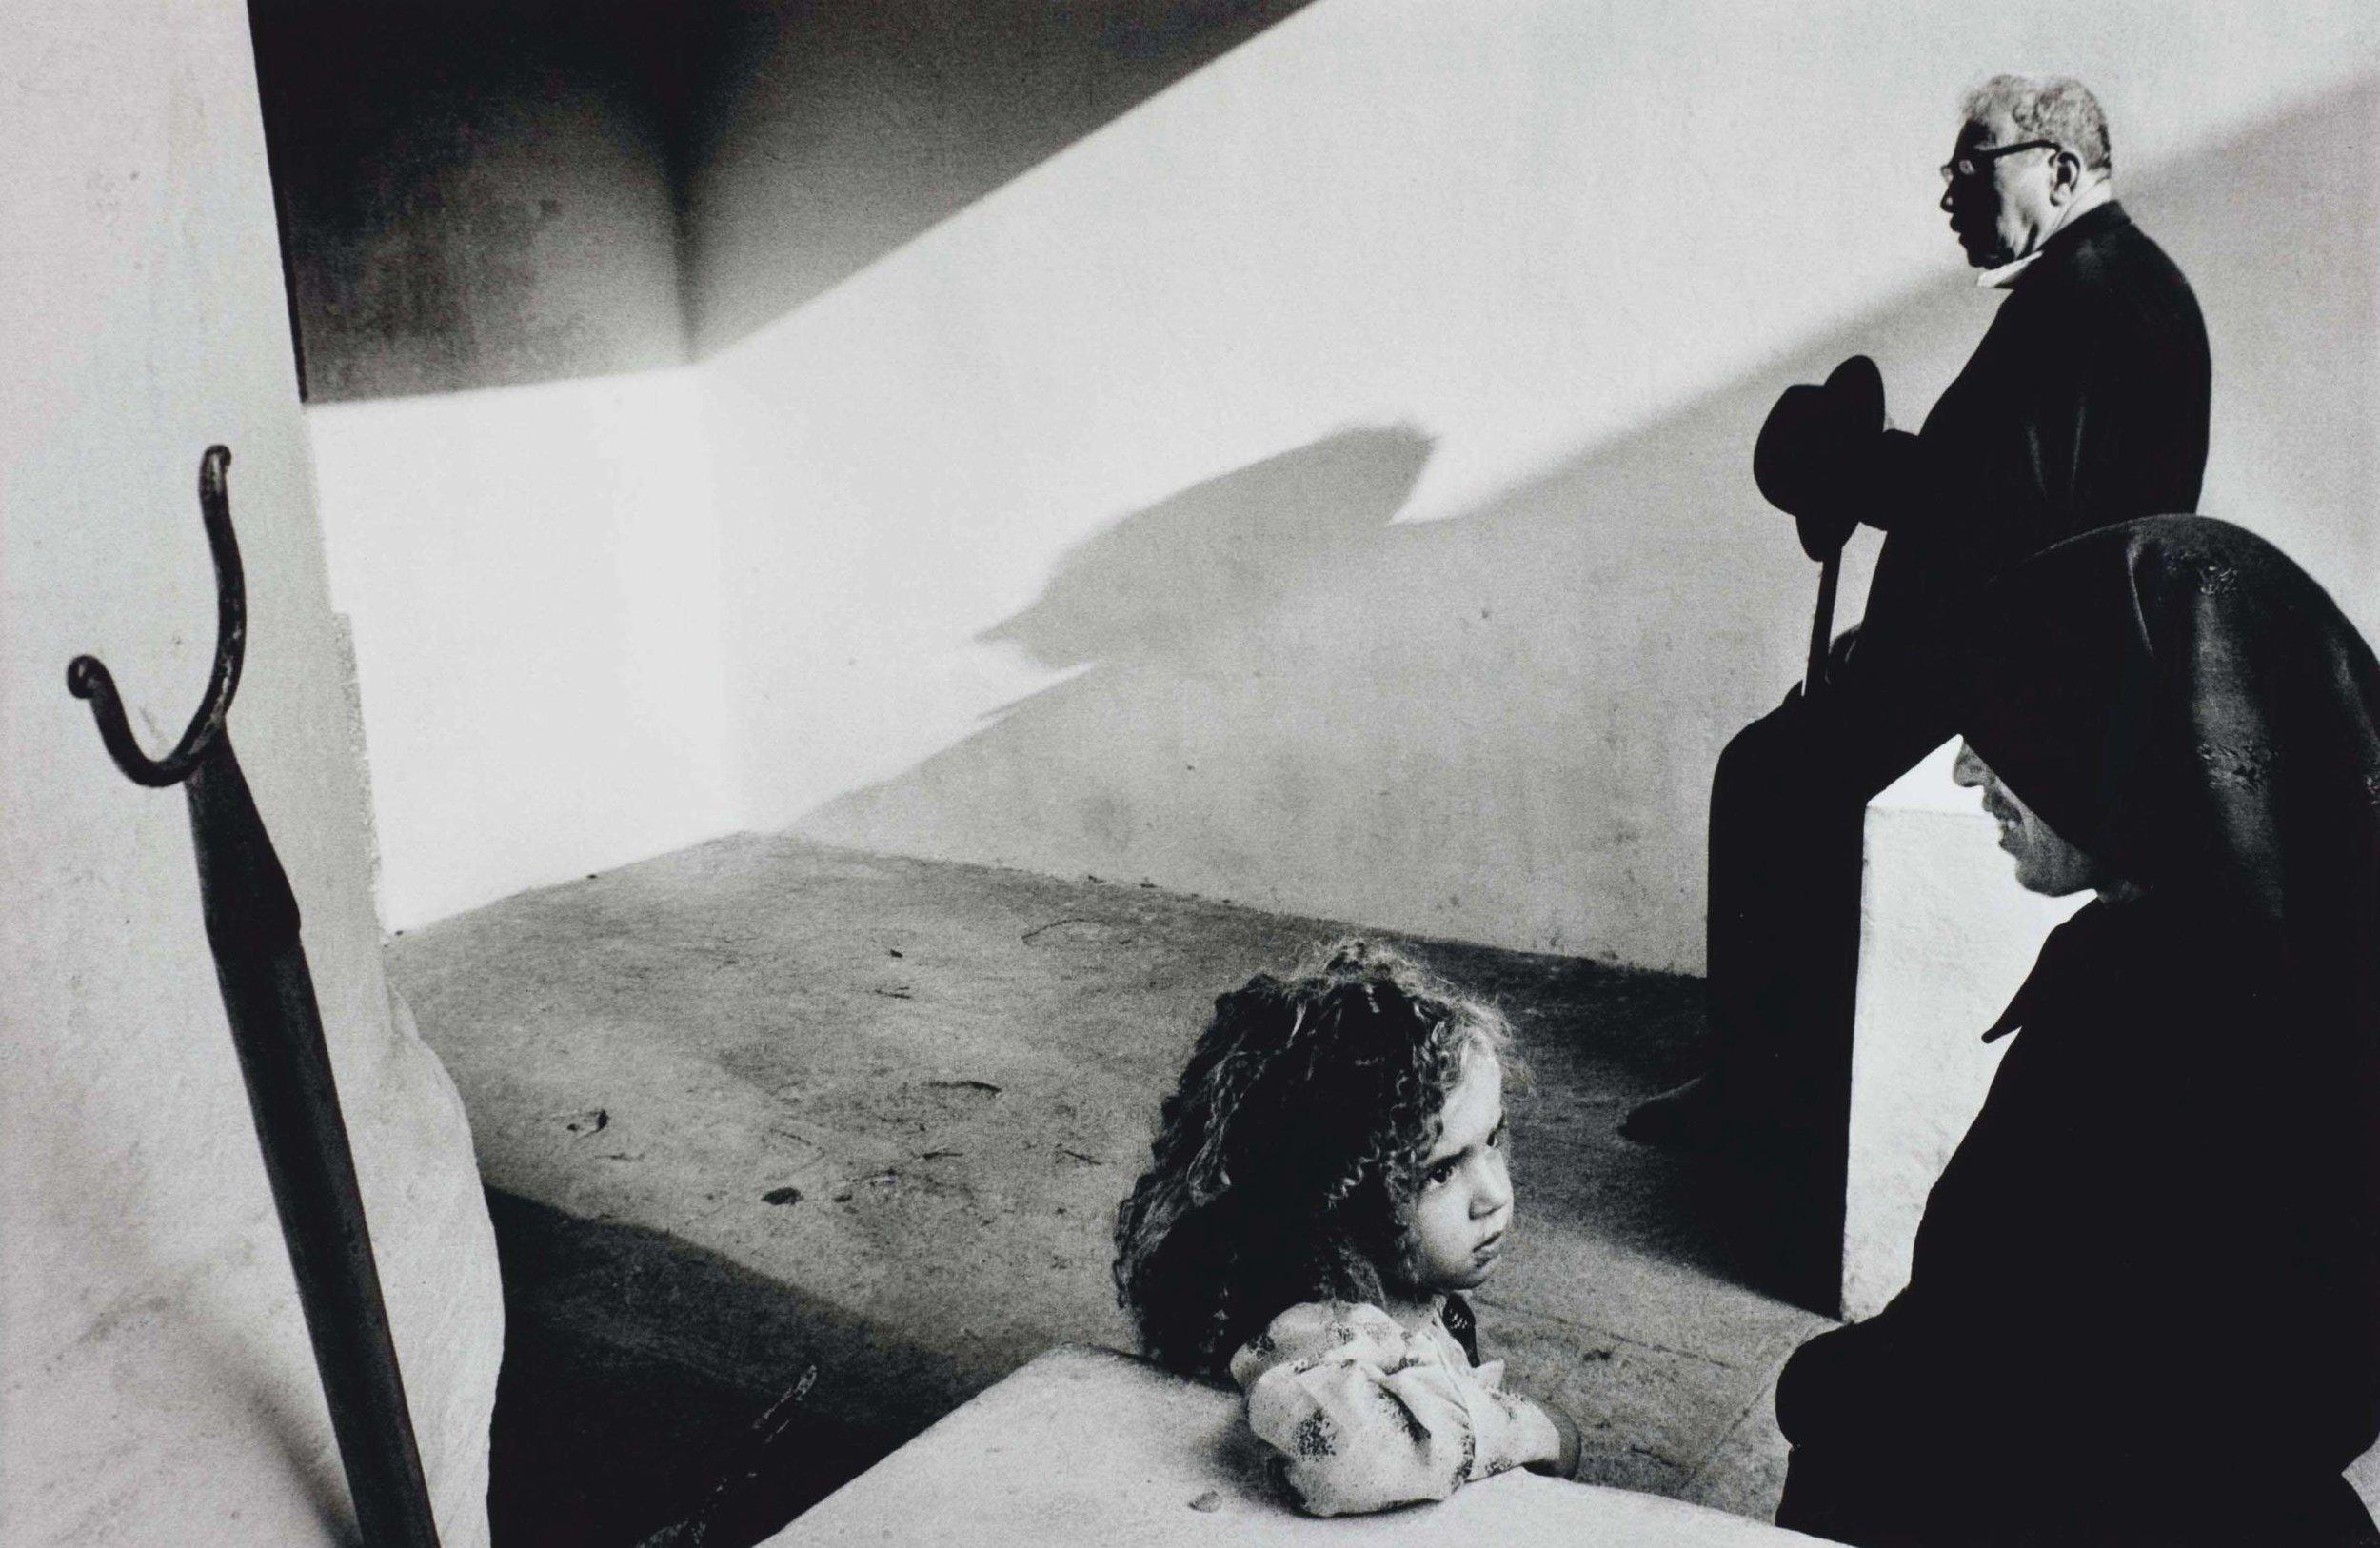 Josef Koudelka, Portogallo, 1976